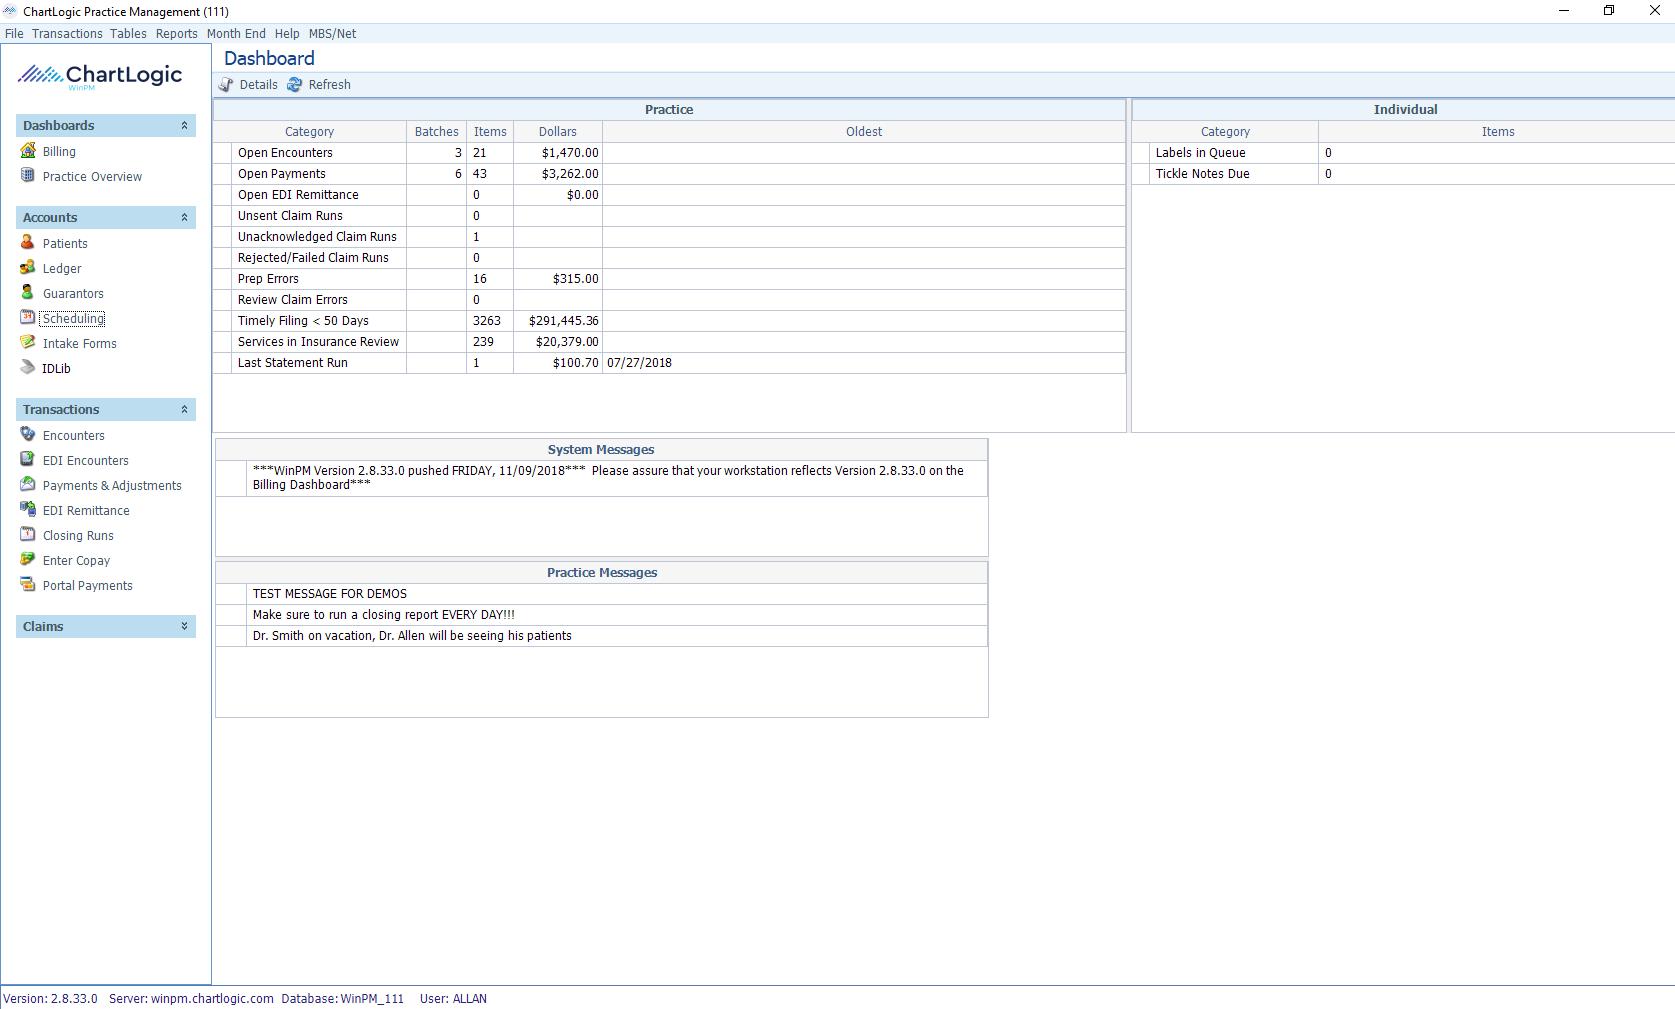 ChartLogic EHR Software - Billing dashboard